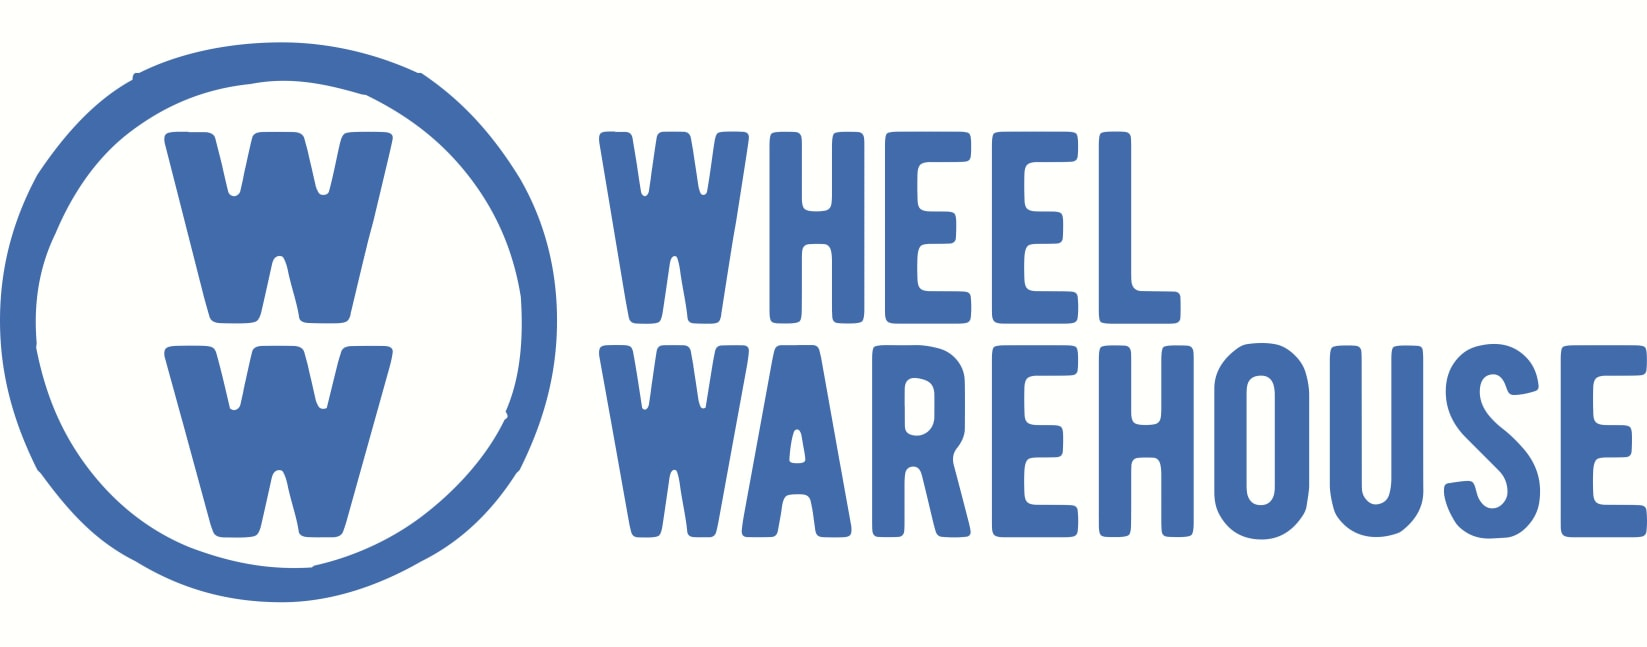 wheel_warehouse_logo_katella-1-w1647.jpg